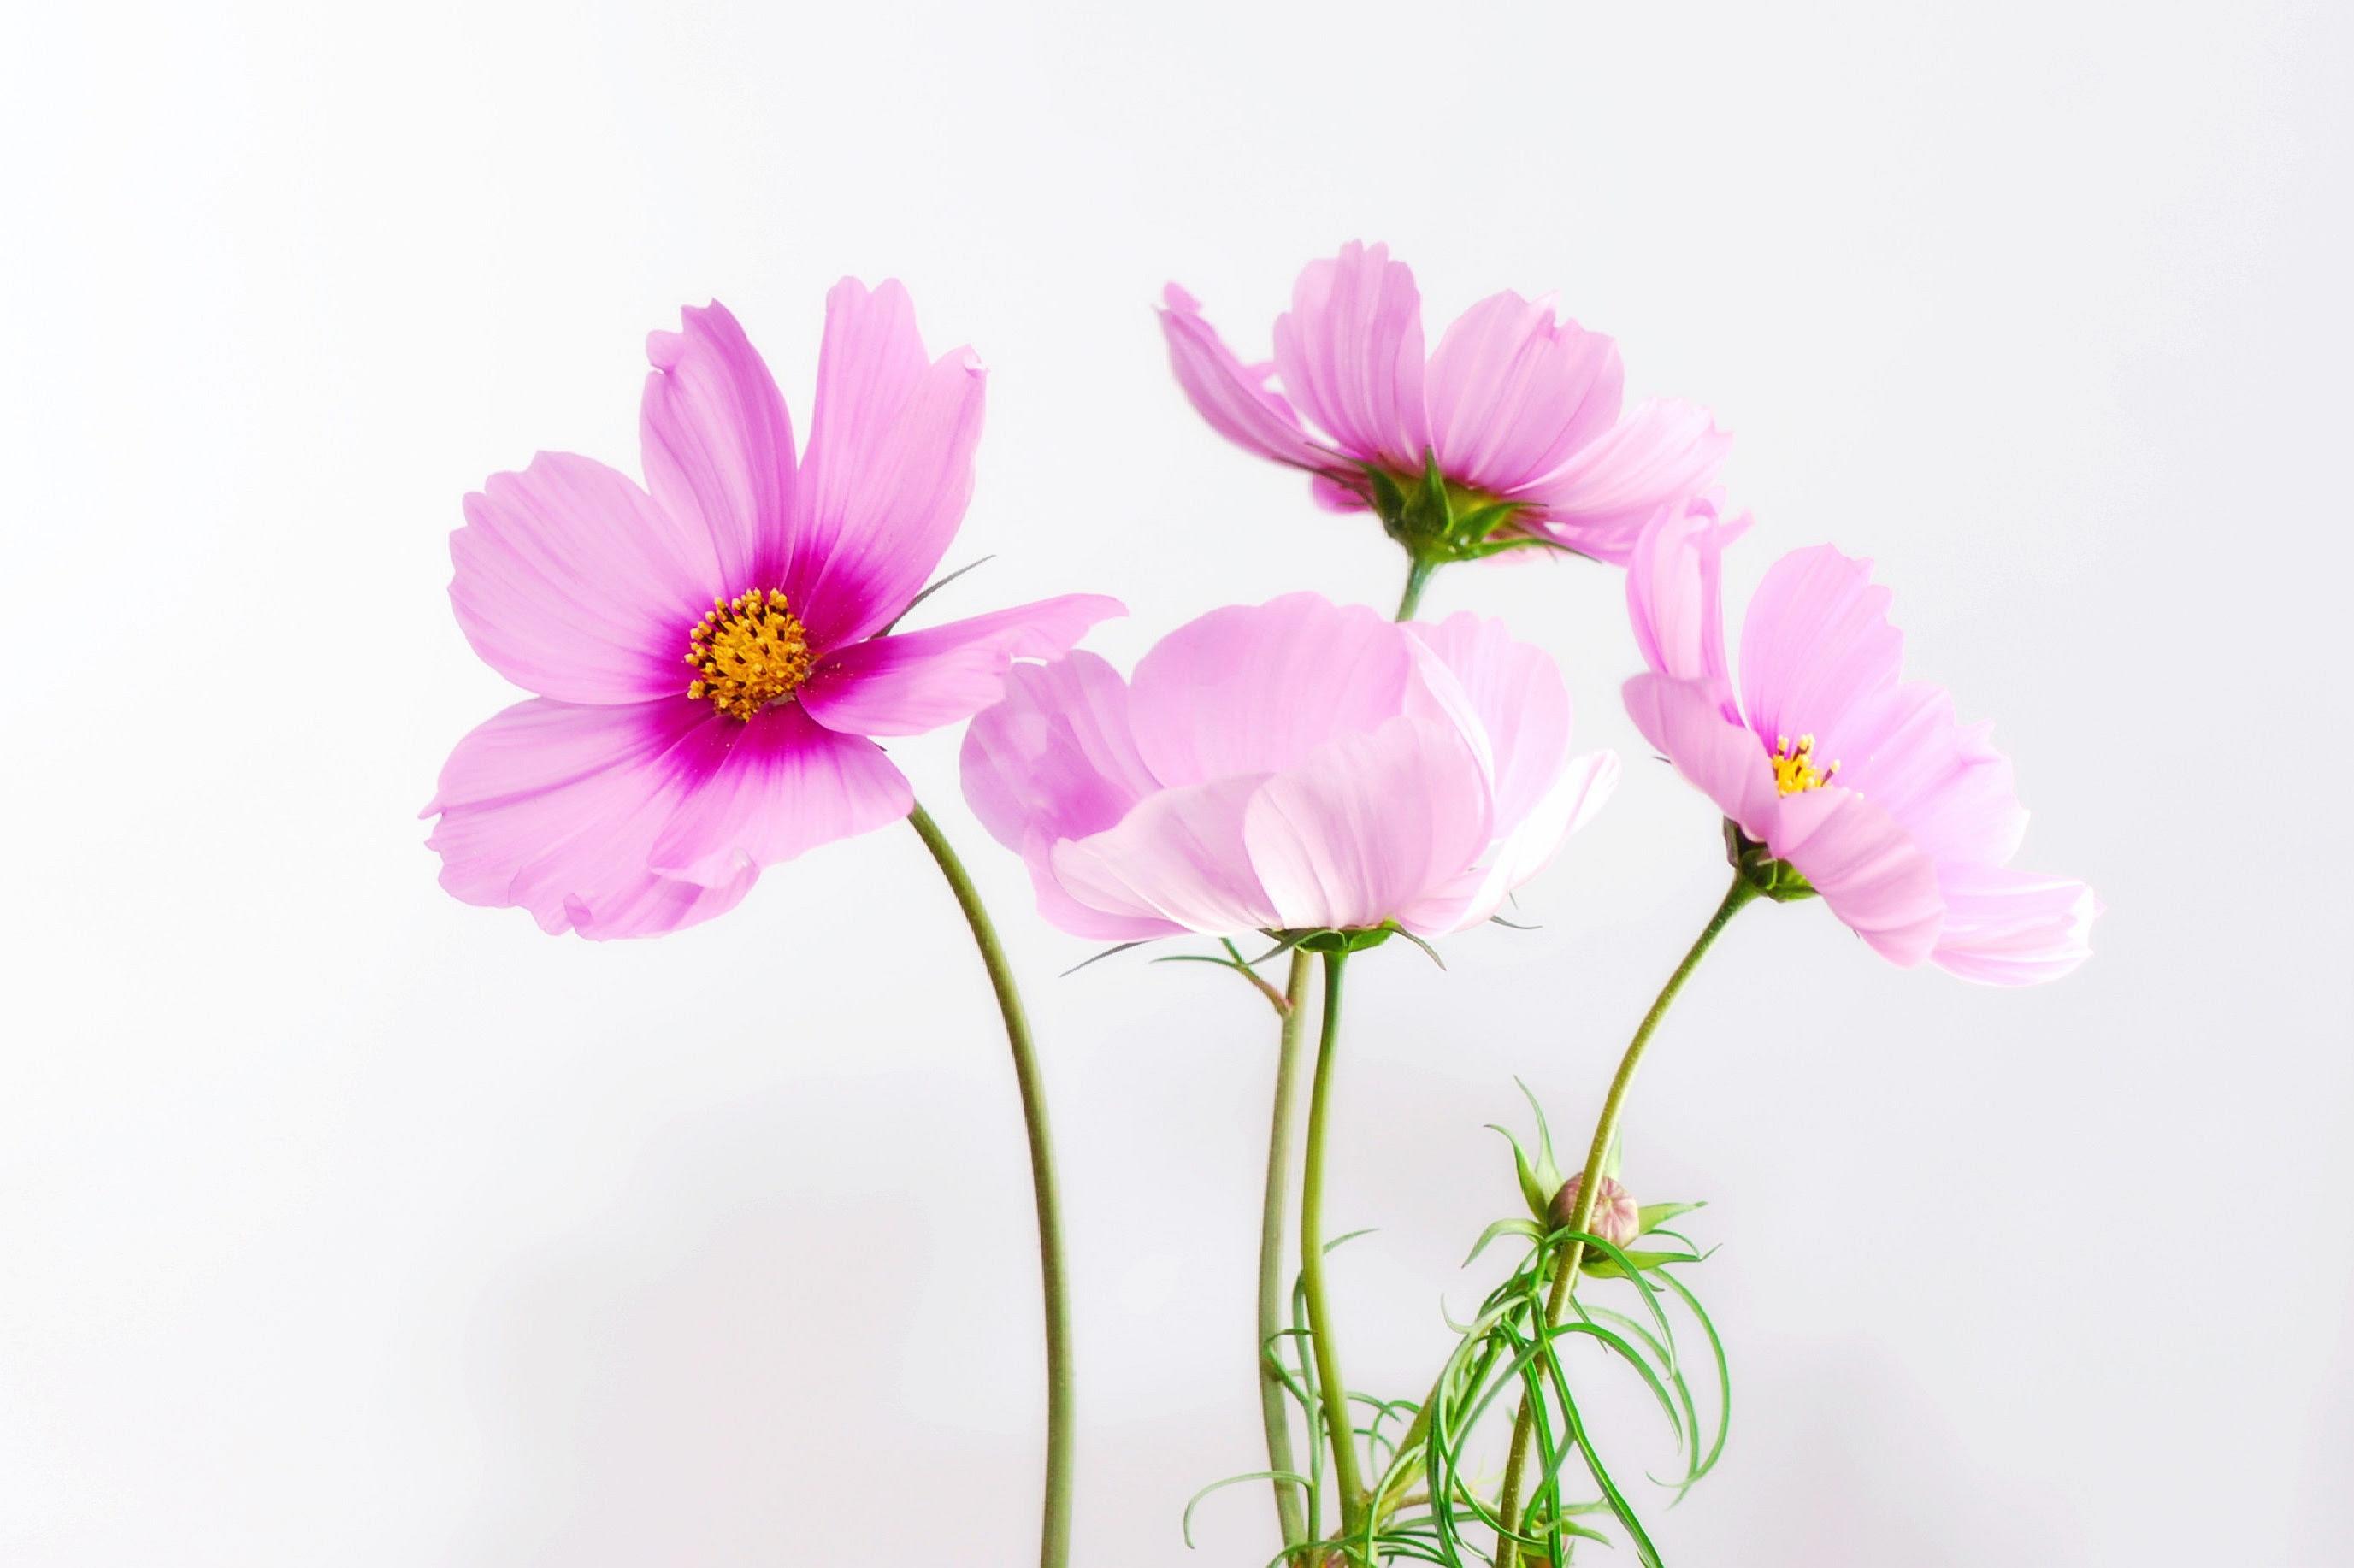 Sring pink flowers